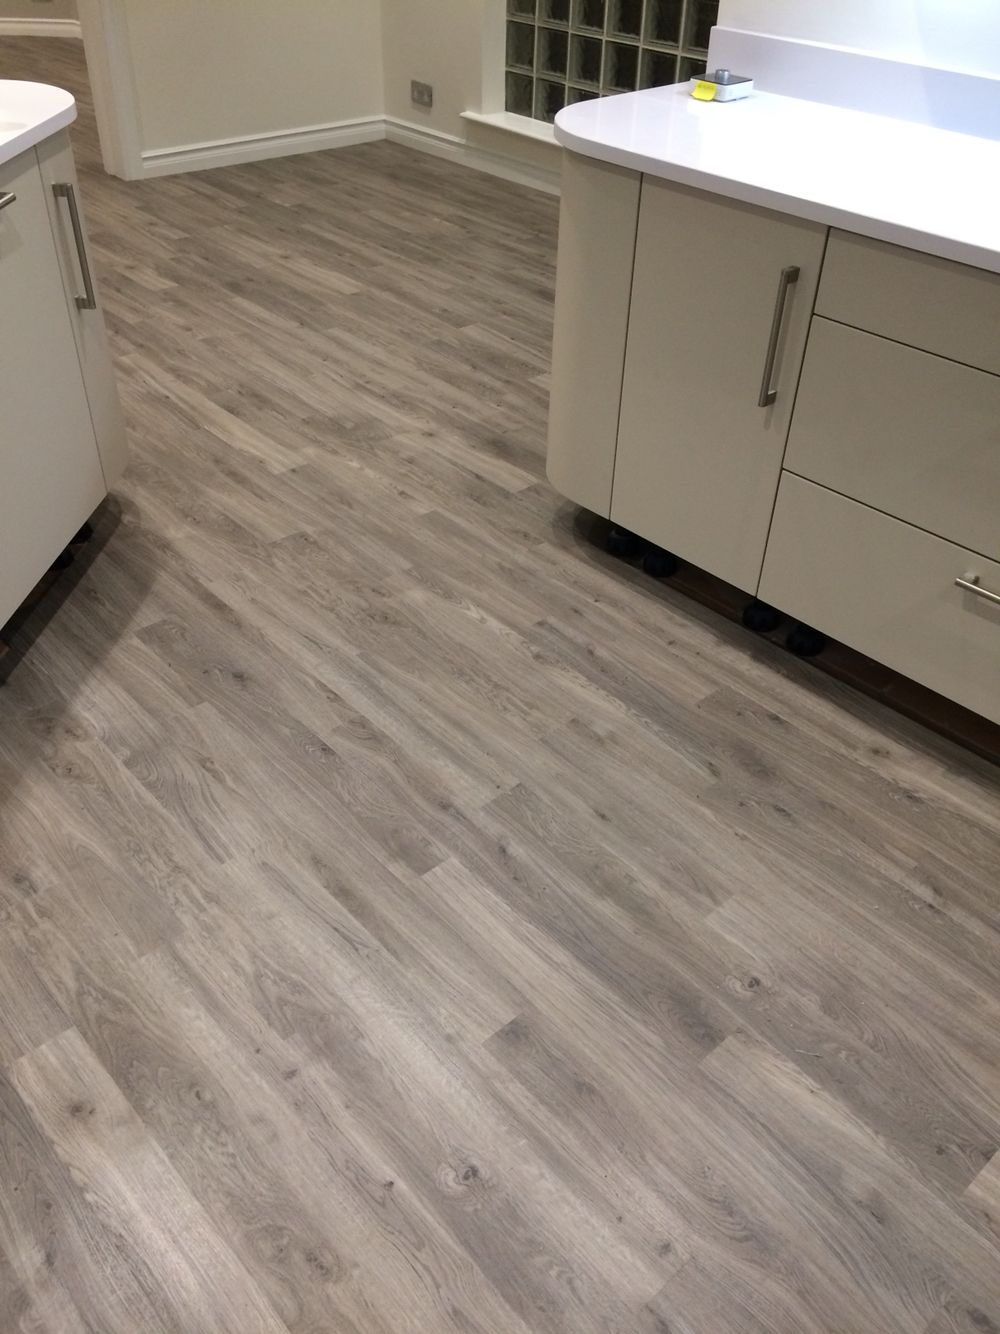 Amtico flooring   Amtico flooring, Flooring, Kitchen flooring